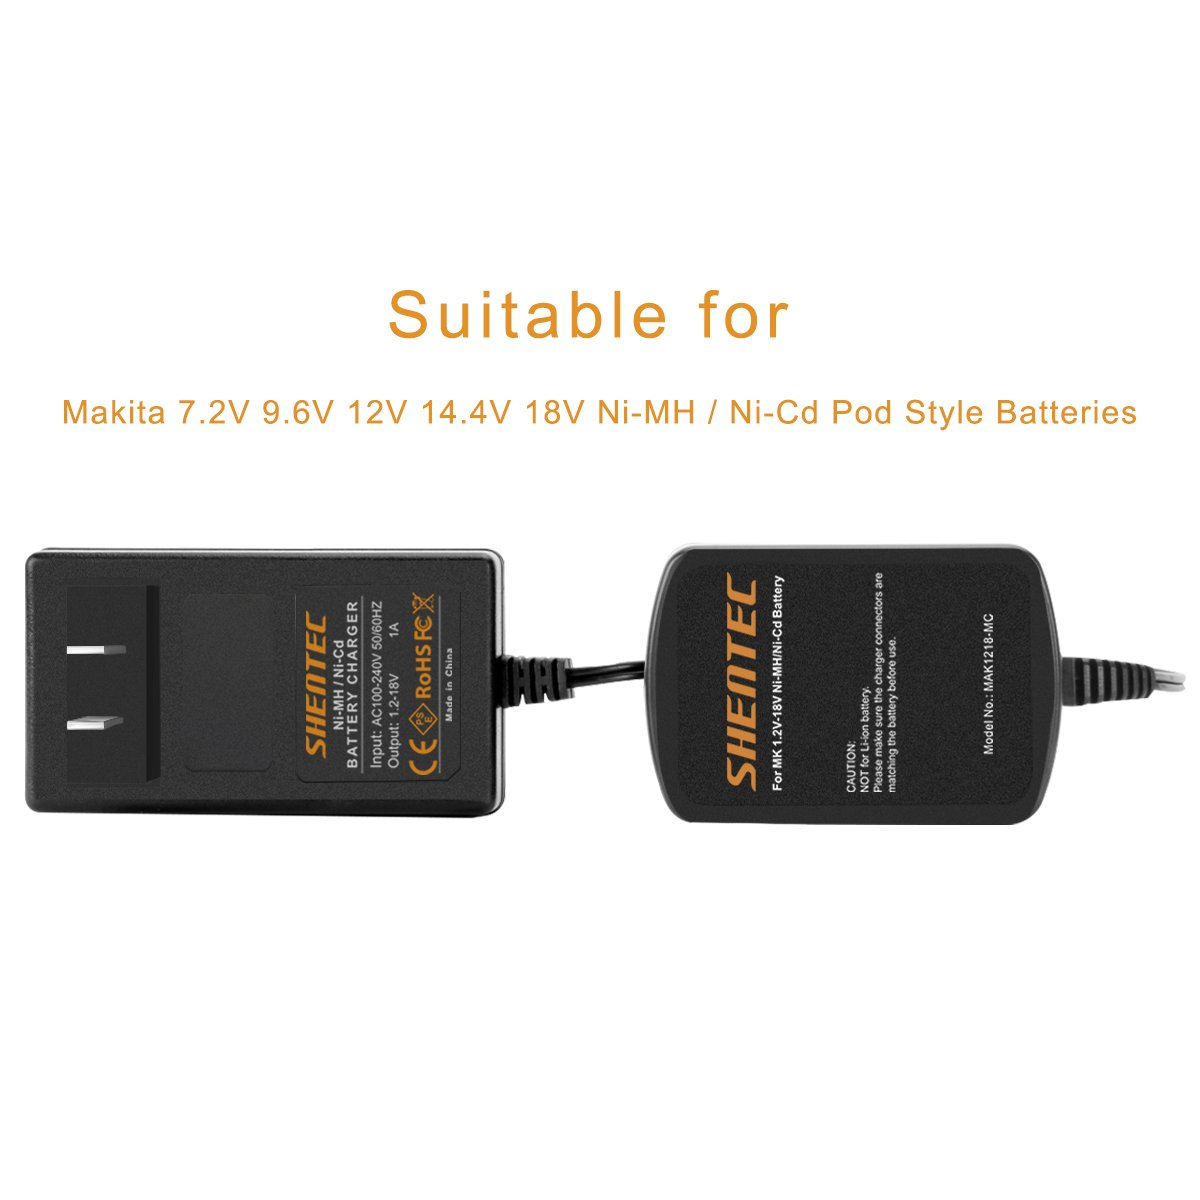 Shentec 12v 18v Charger Compatible With Makita 72v 96v 144v Battery Wiring Diagram Ni Mh Cd Pod Style Batteries Tools Home Improvement